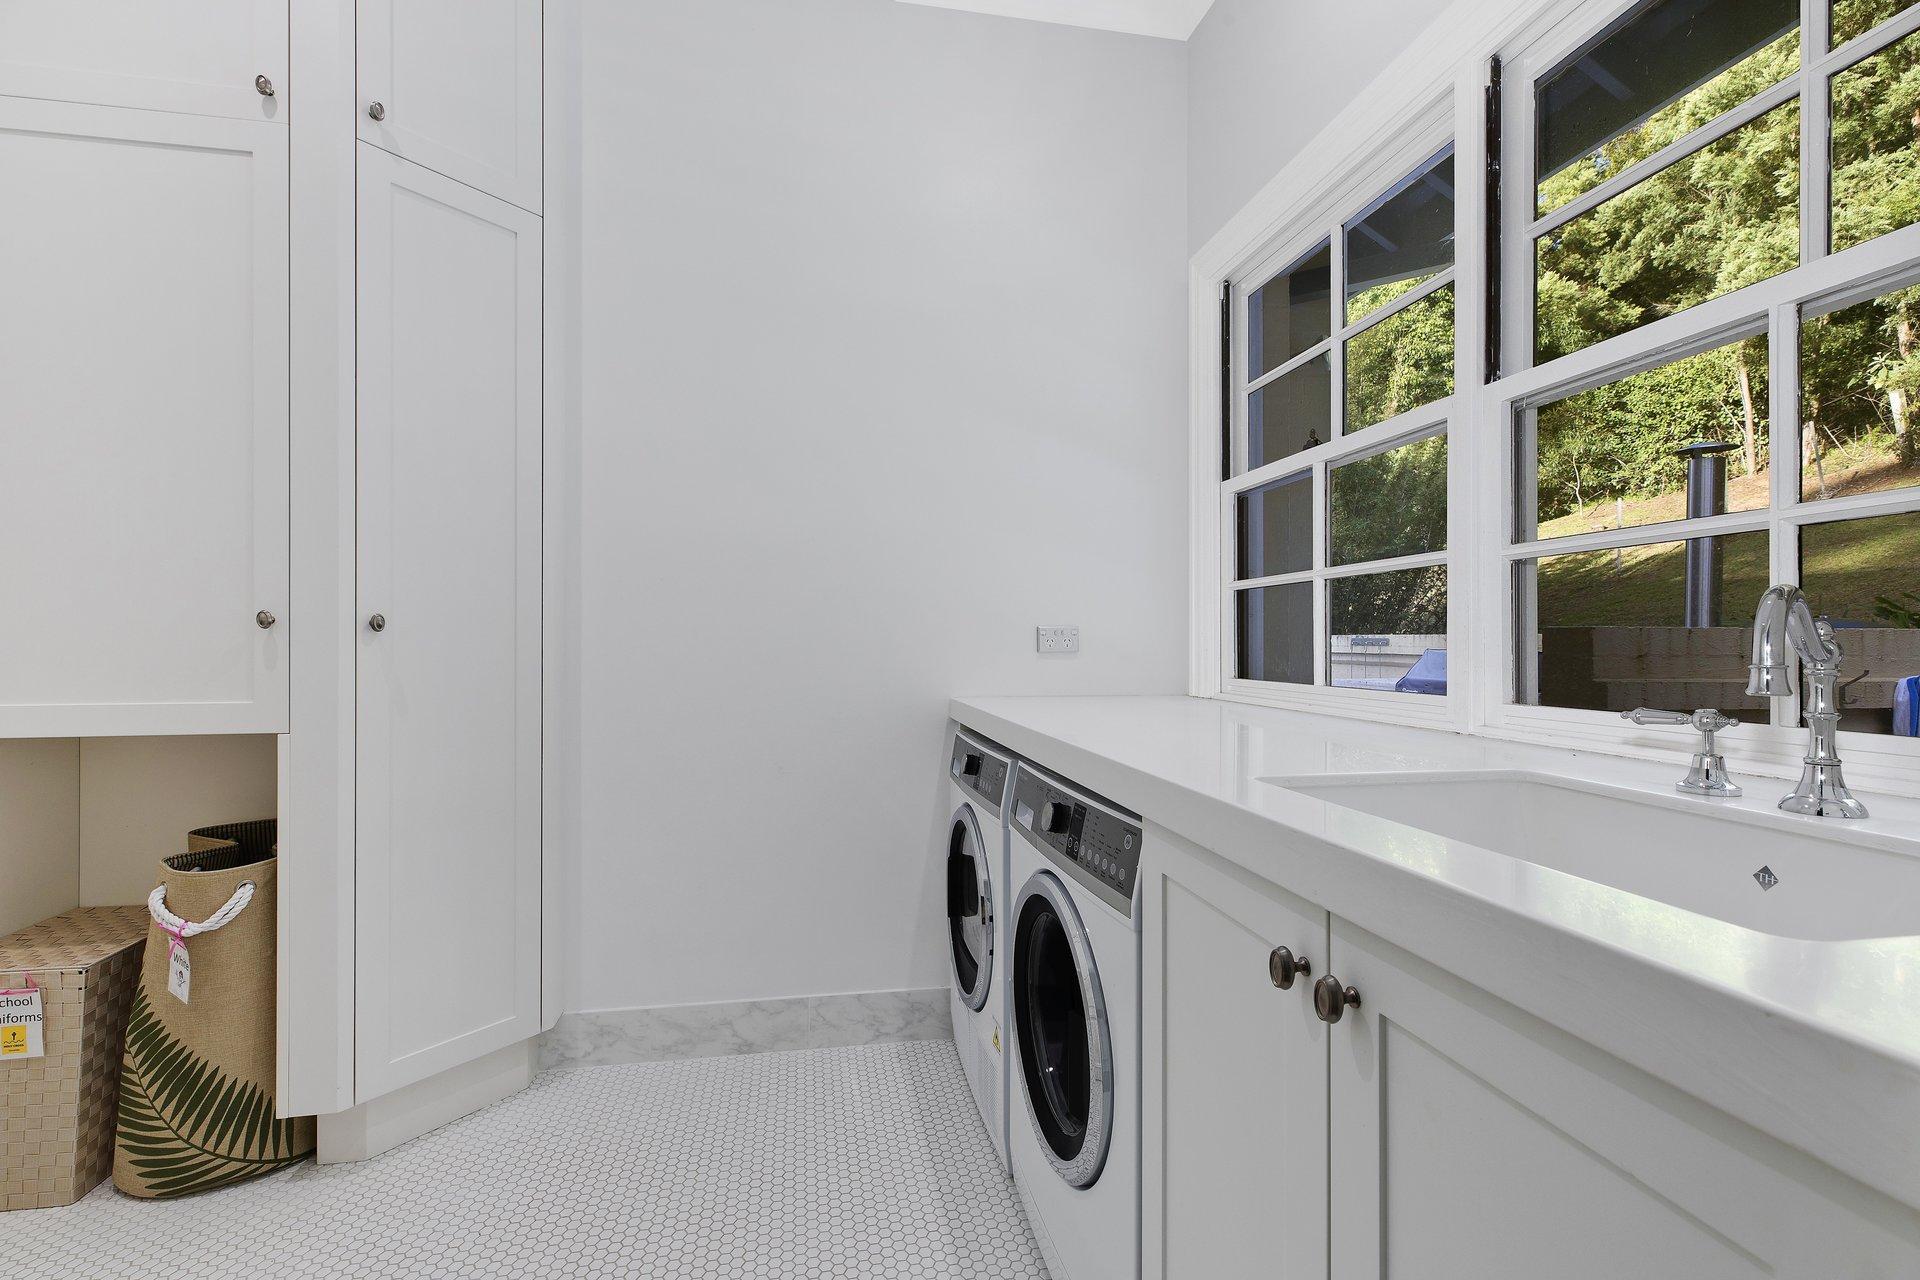 laundry and vanity